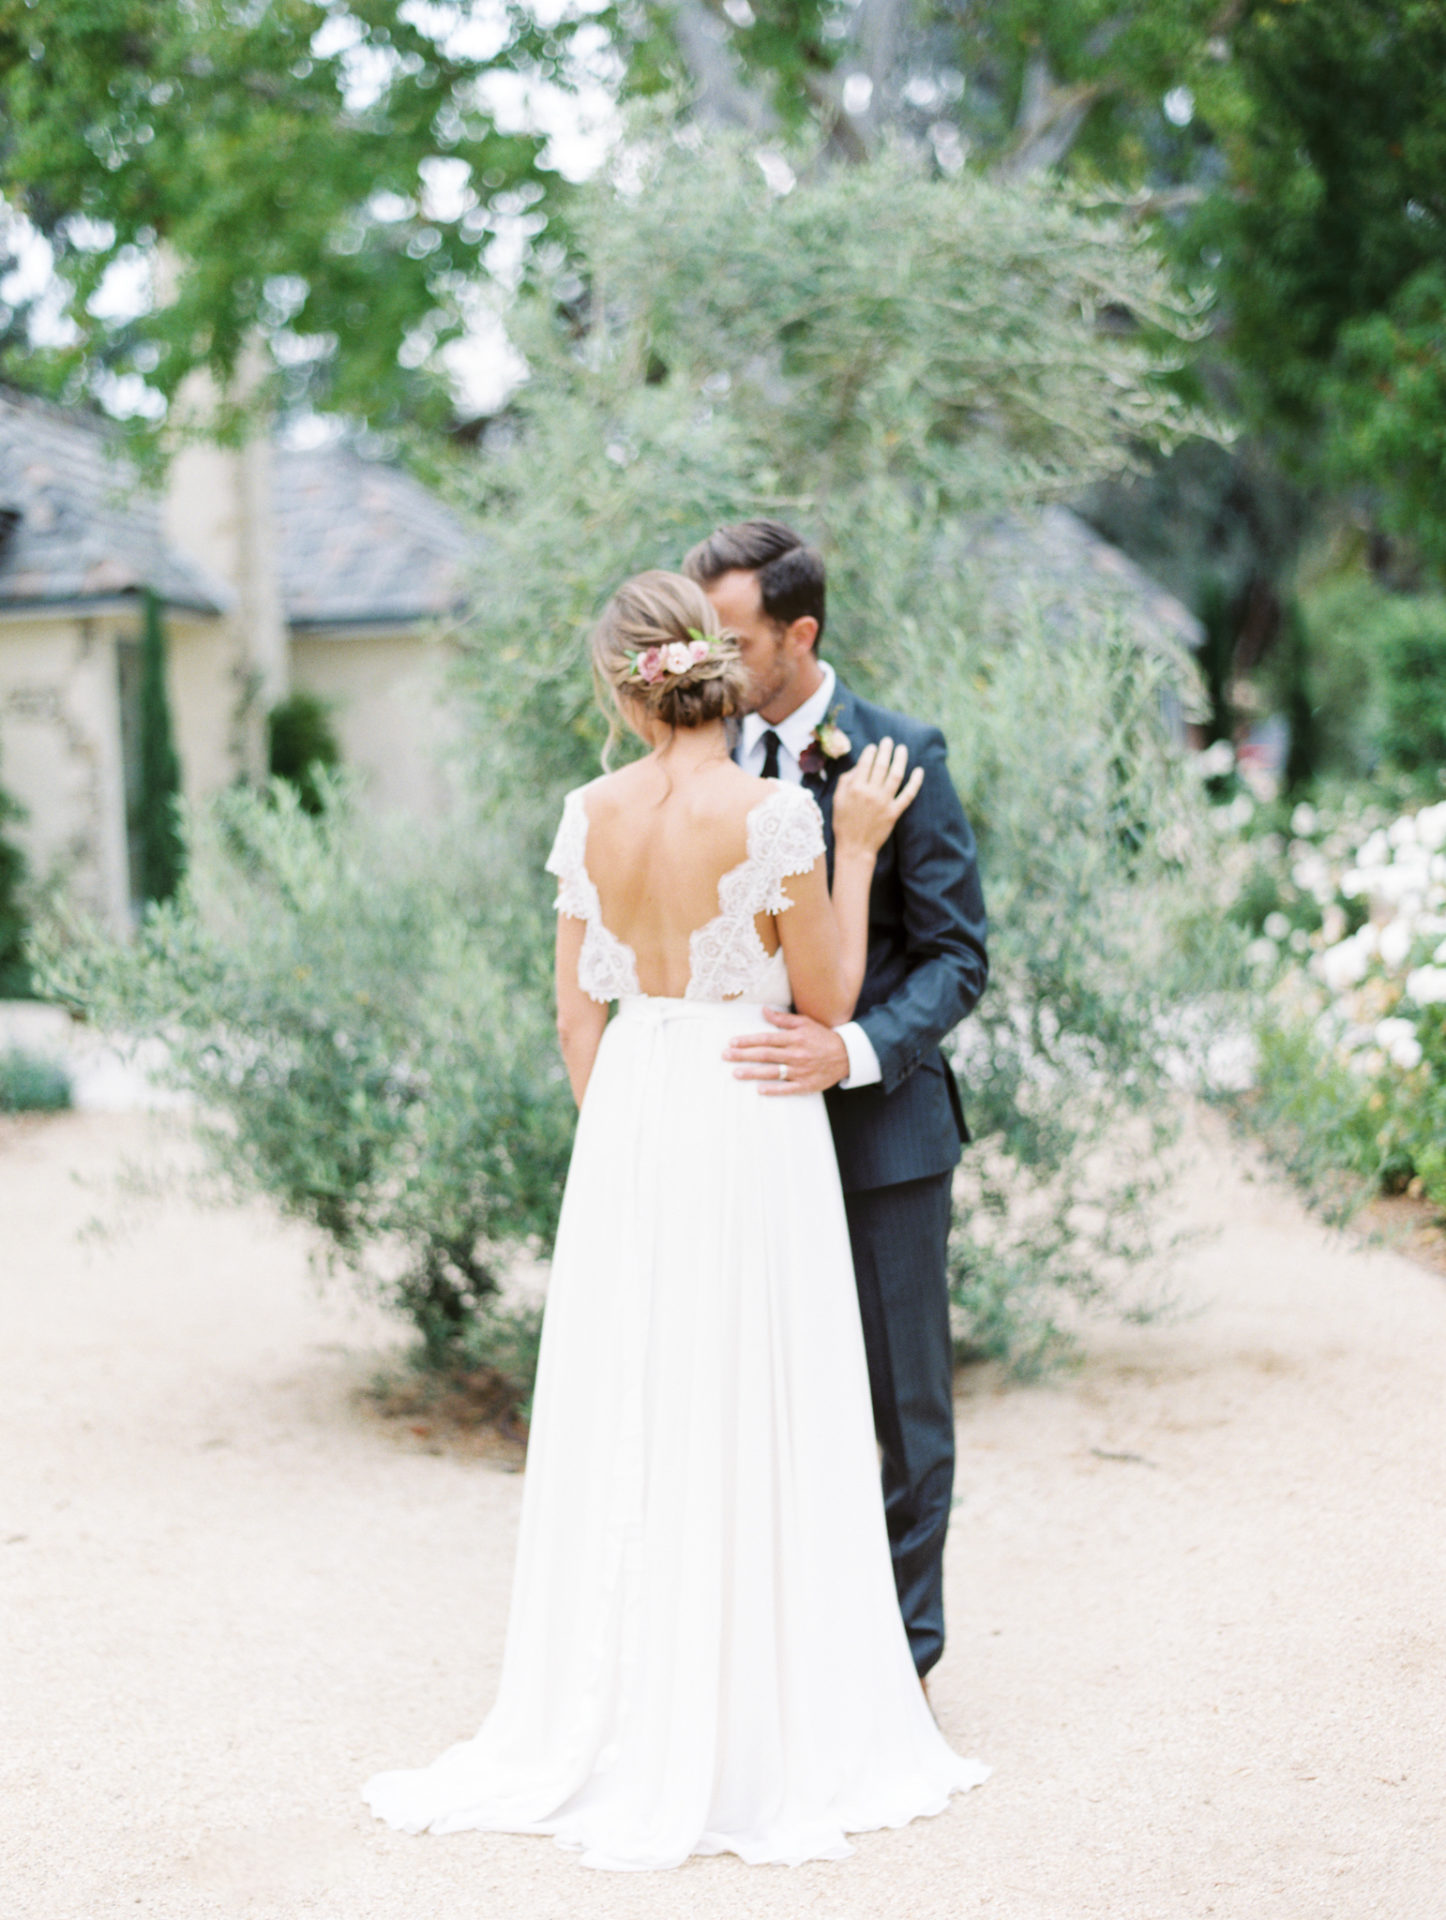 Timeless Spring Wedding Design With A Modern Twist Wedding Stationery